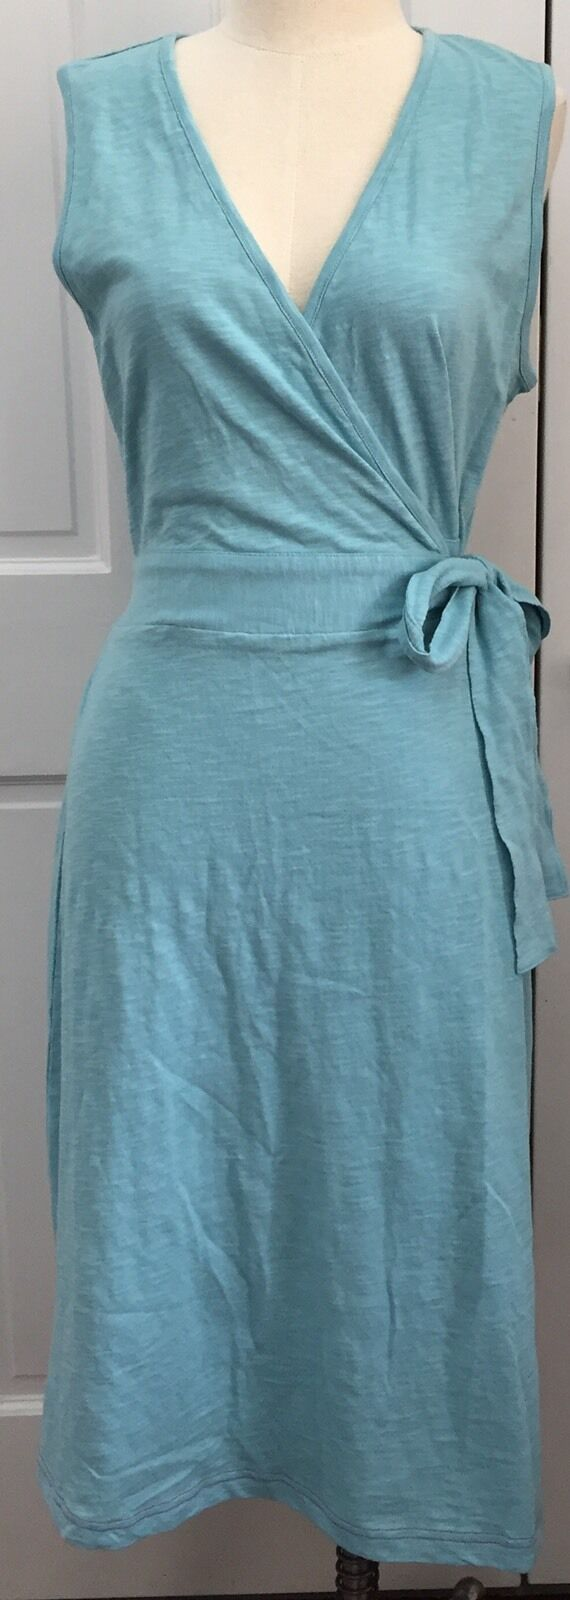 Womens Matilda Jane Good Hart Flower Shop Kimono Dress Size XL X Large EUC